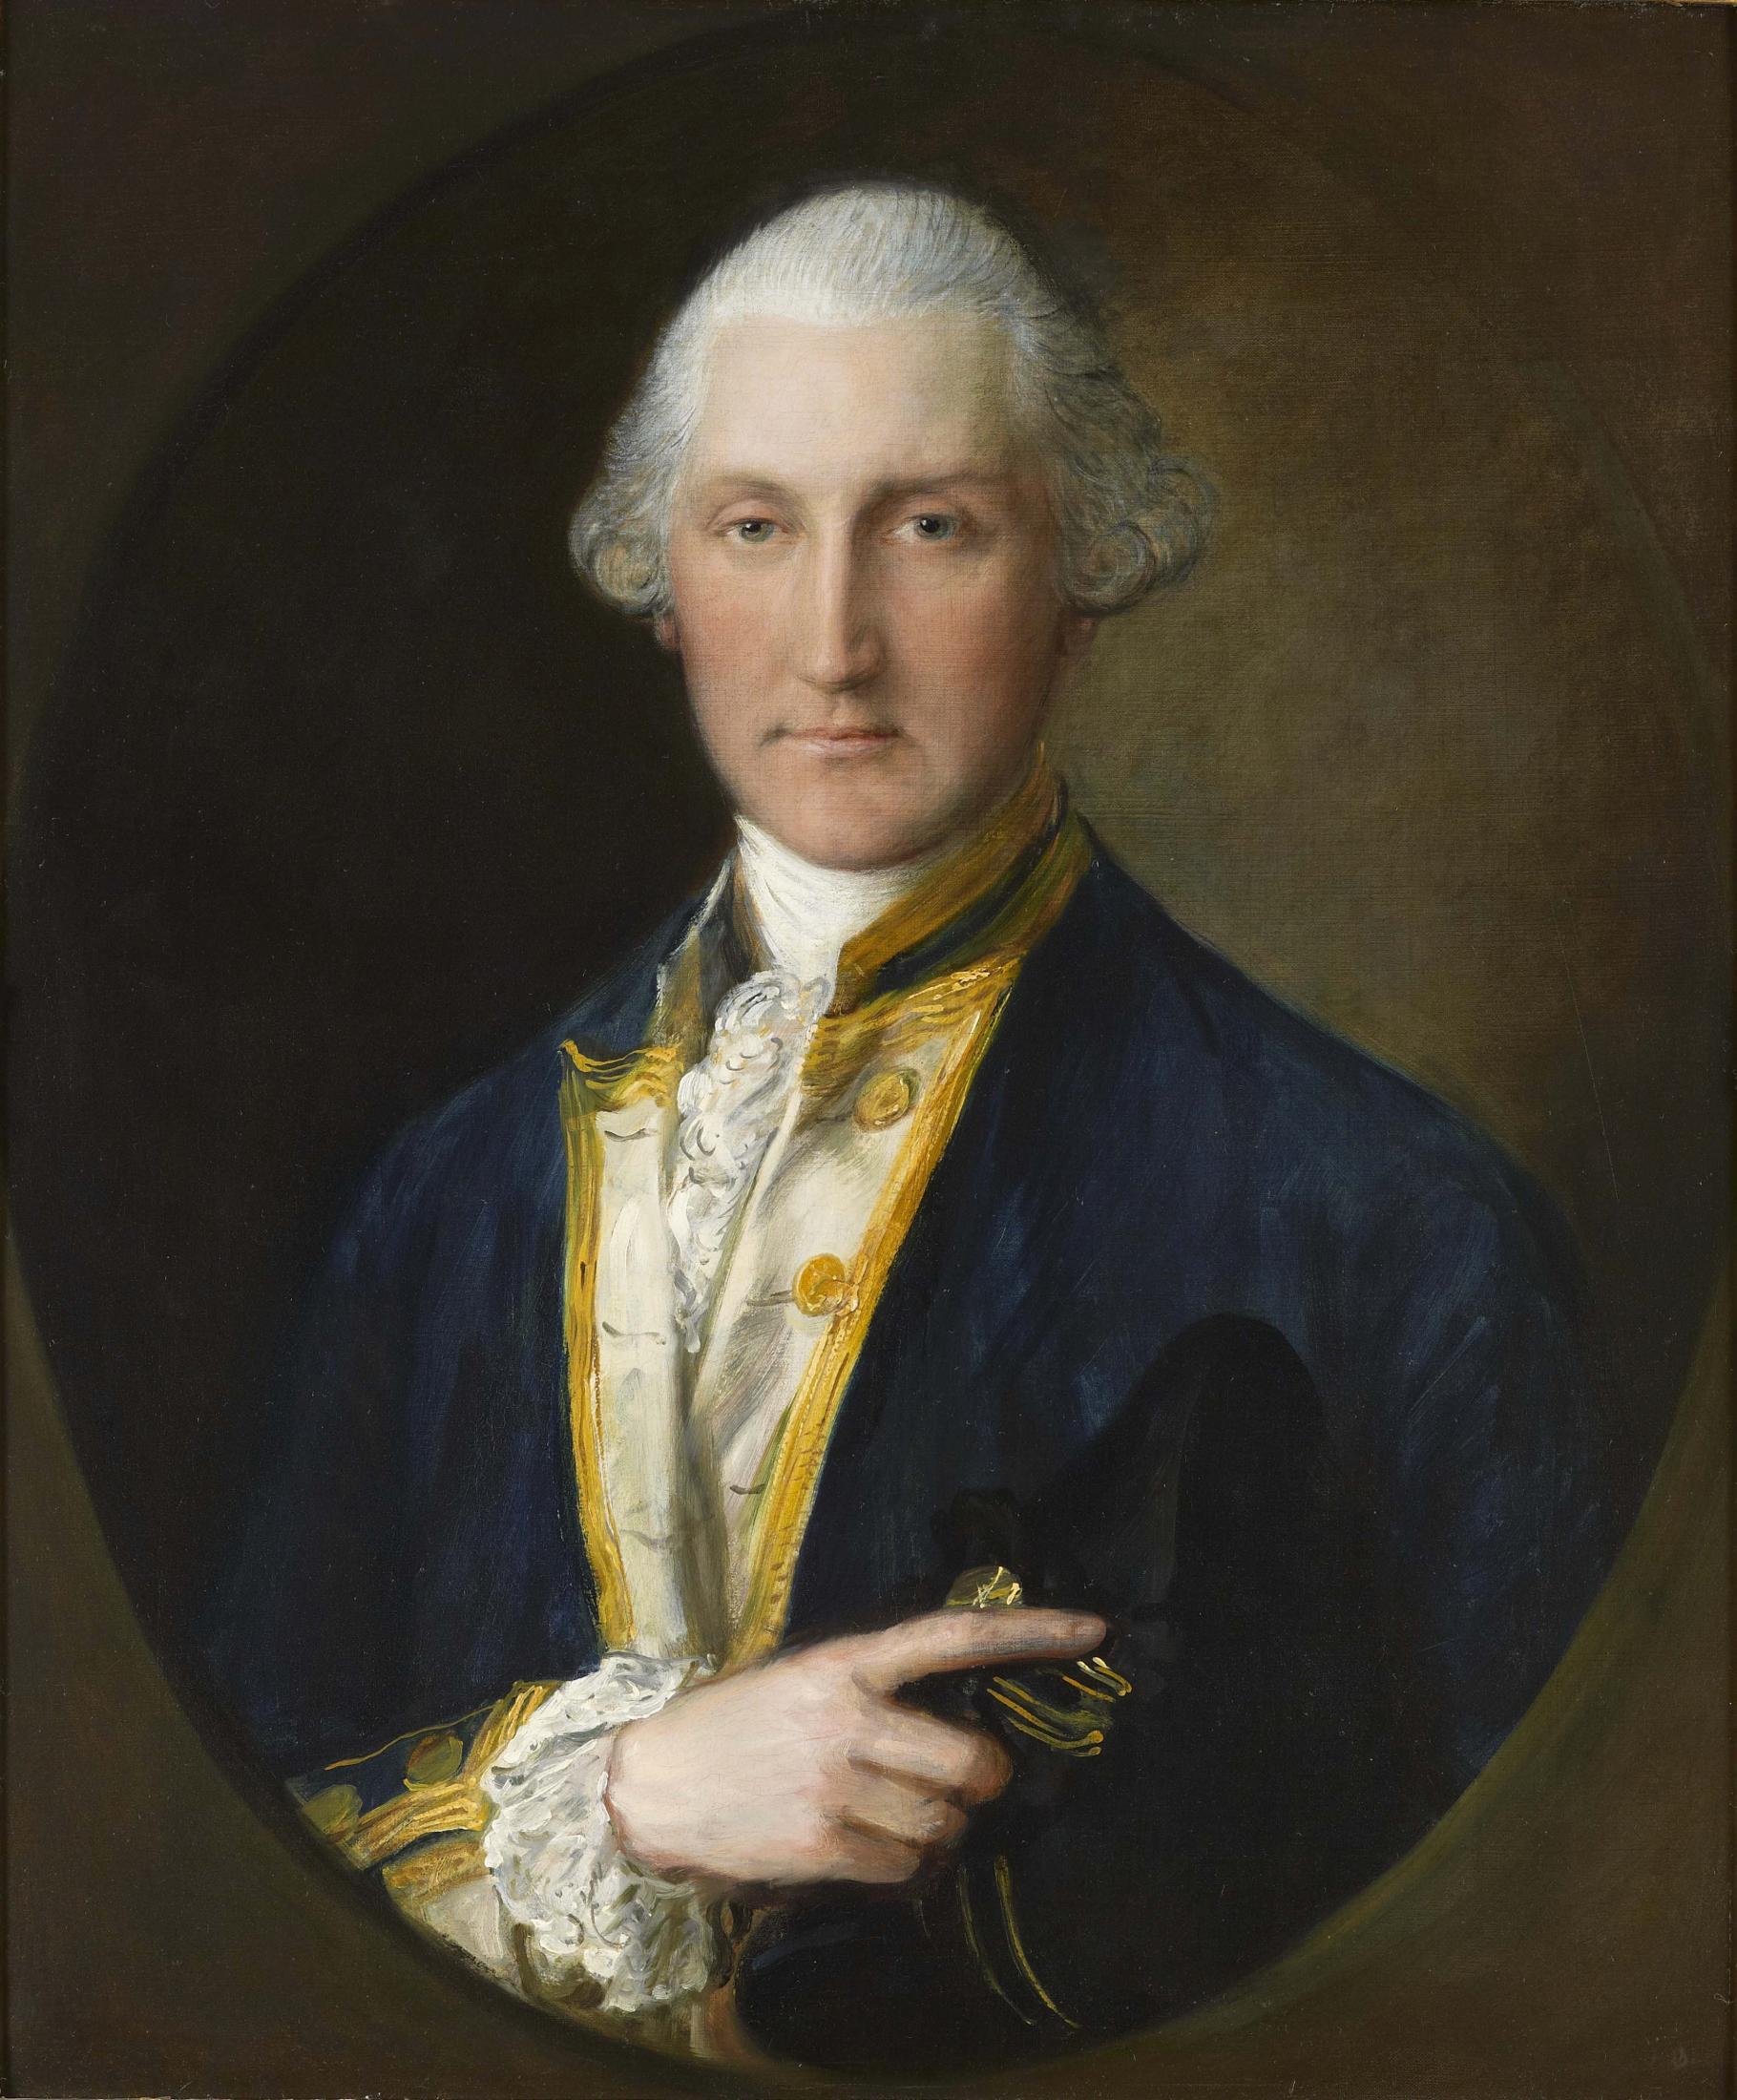 Portrait of Lord William Campbell, M.P., Last British Governor of South Carolina